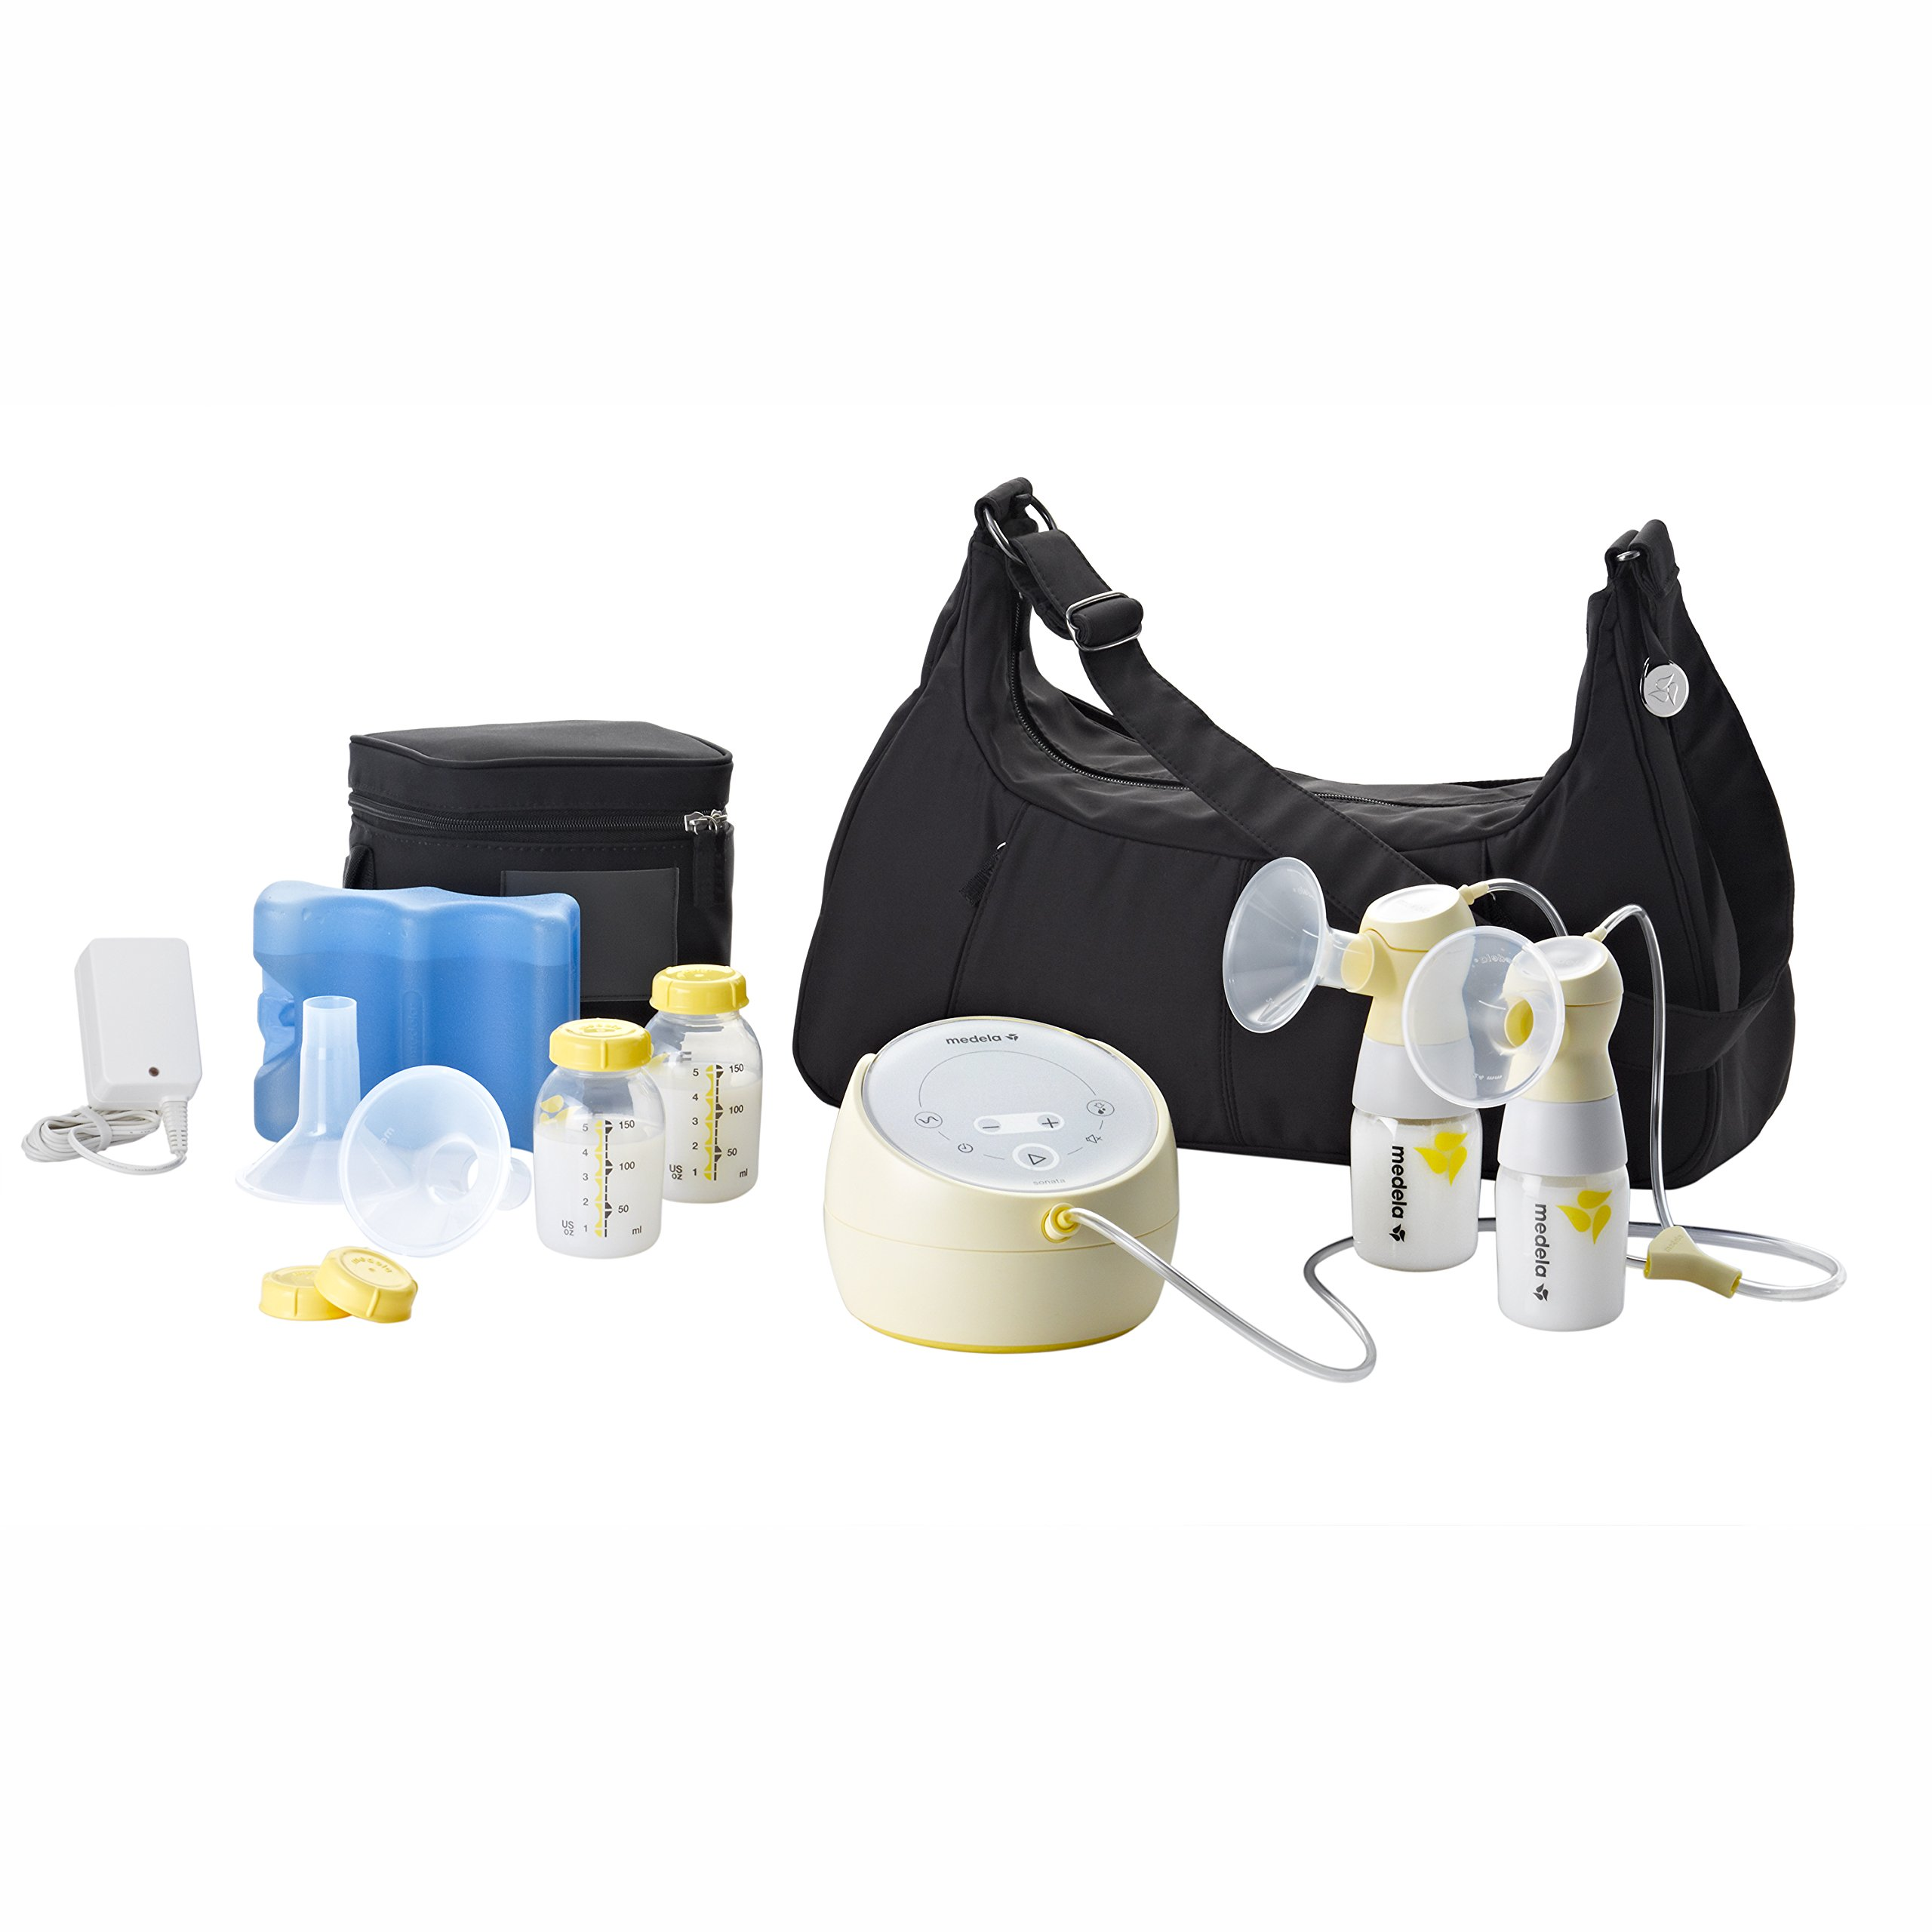 Medela Sonata Smart Breast Pump by Medela (Image #3)